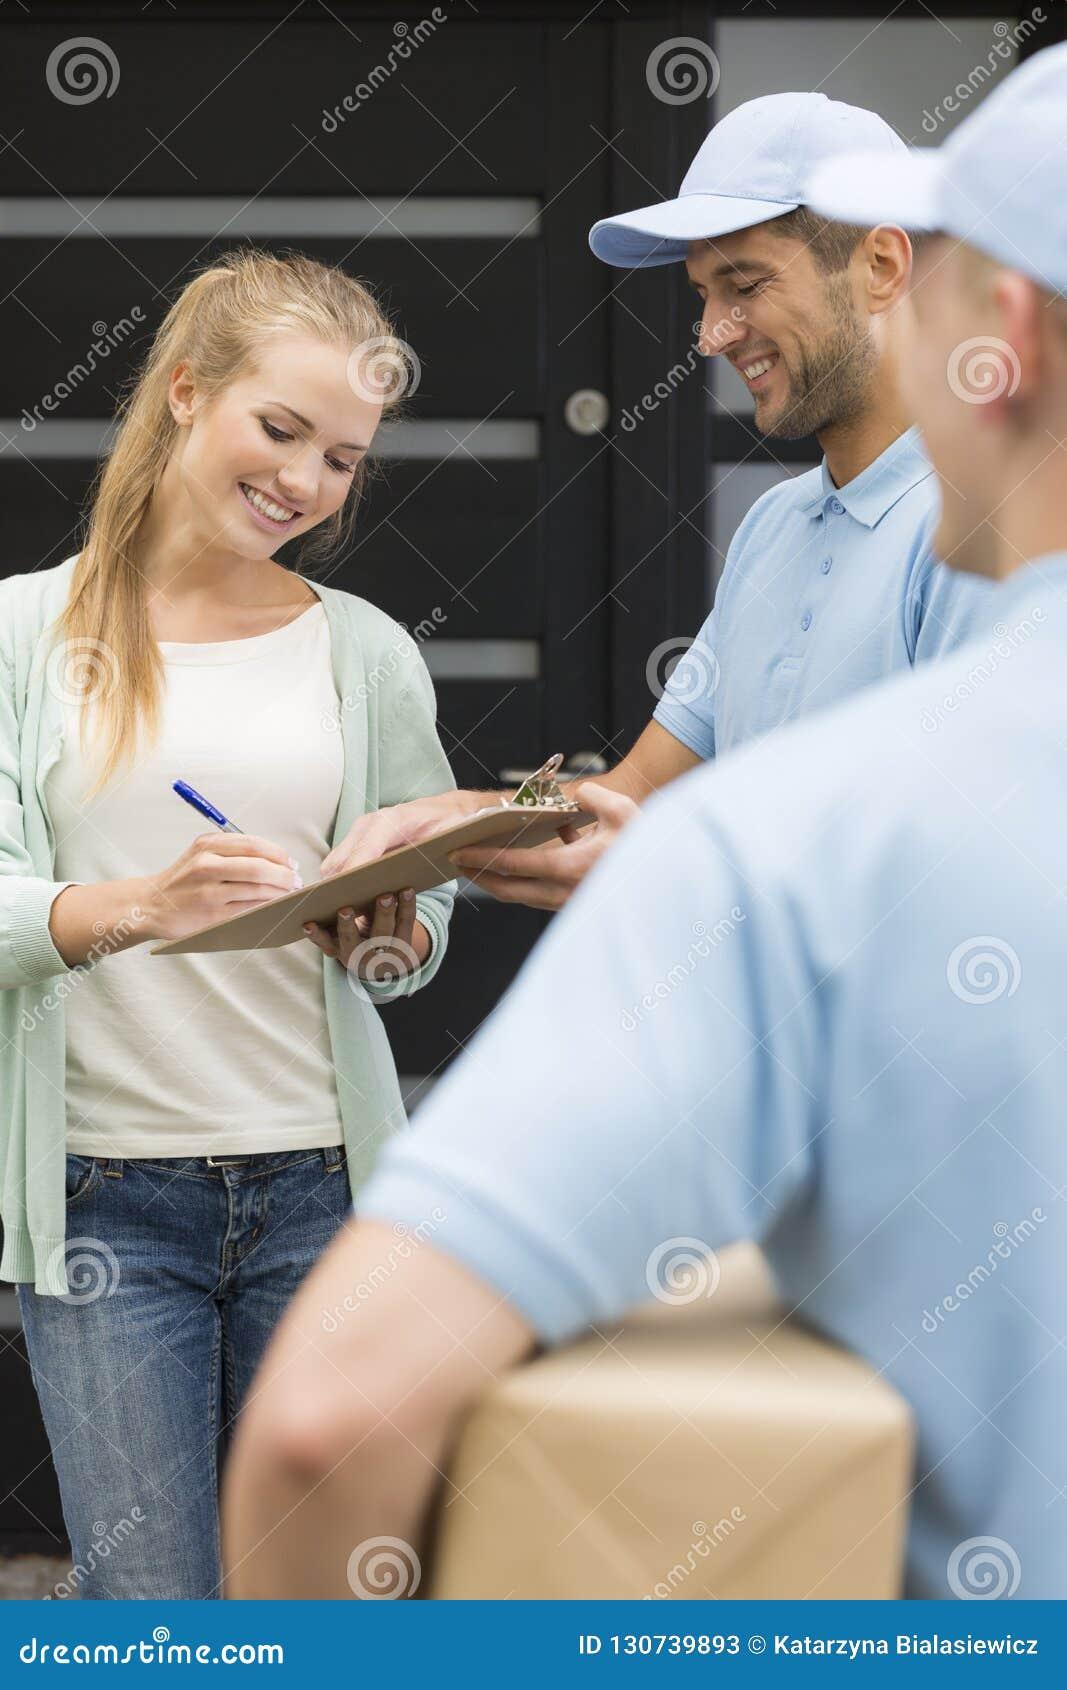 Koeriers en glimlachende klant die ontvangstbewijs van pakketlevering ondertekenen